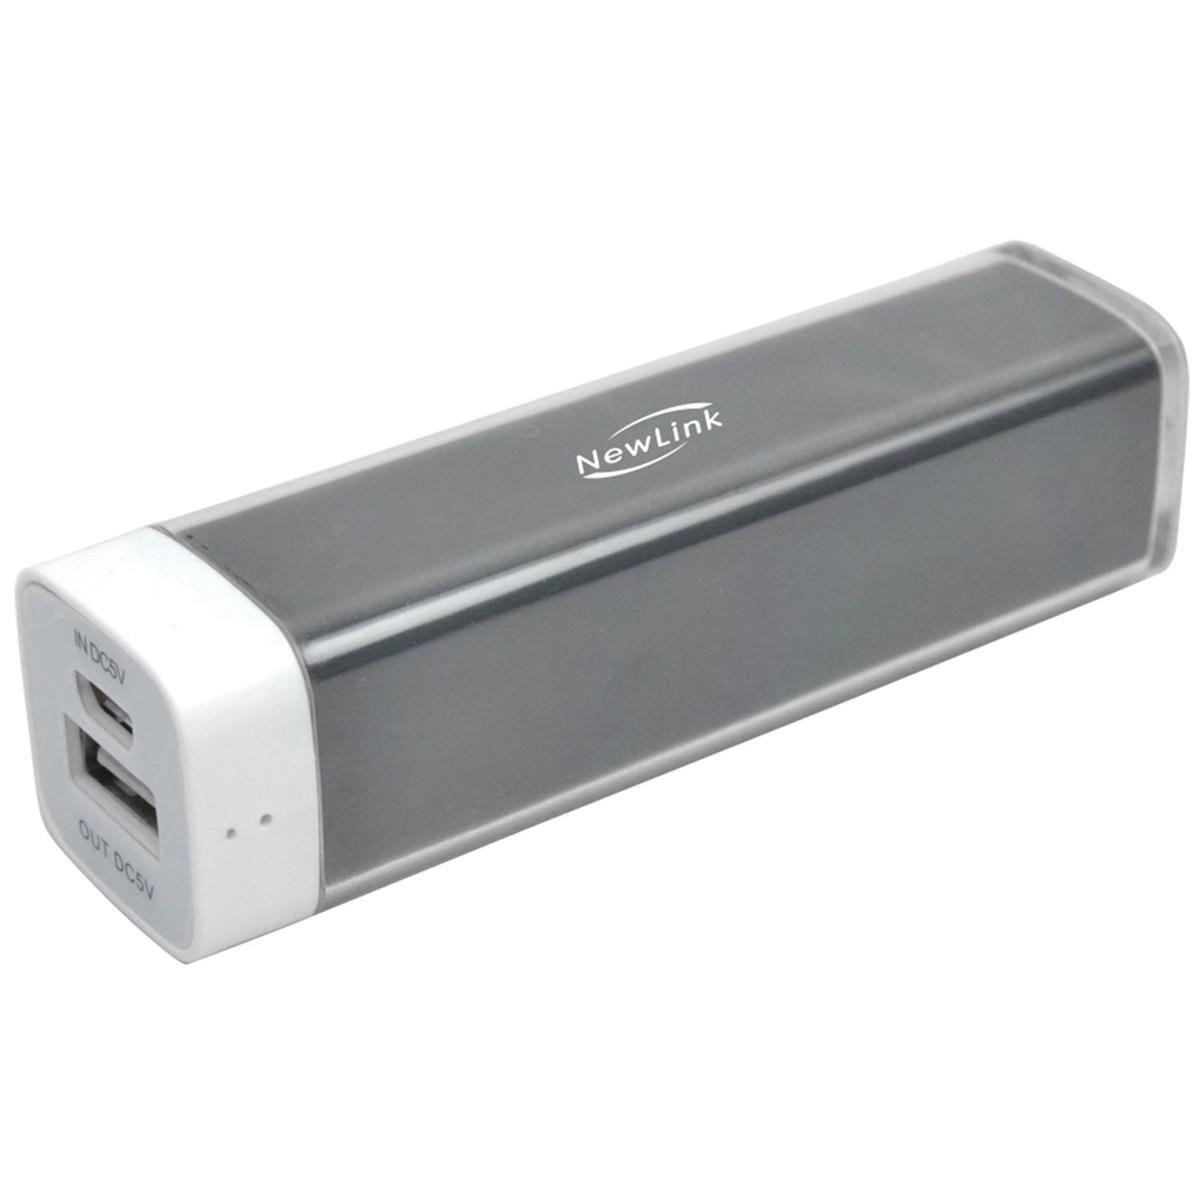 Bateria Externa Tube 2500Mah Preto Be201 Newlink